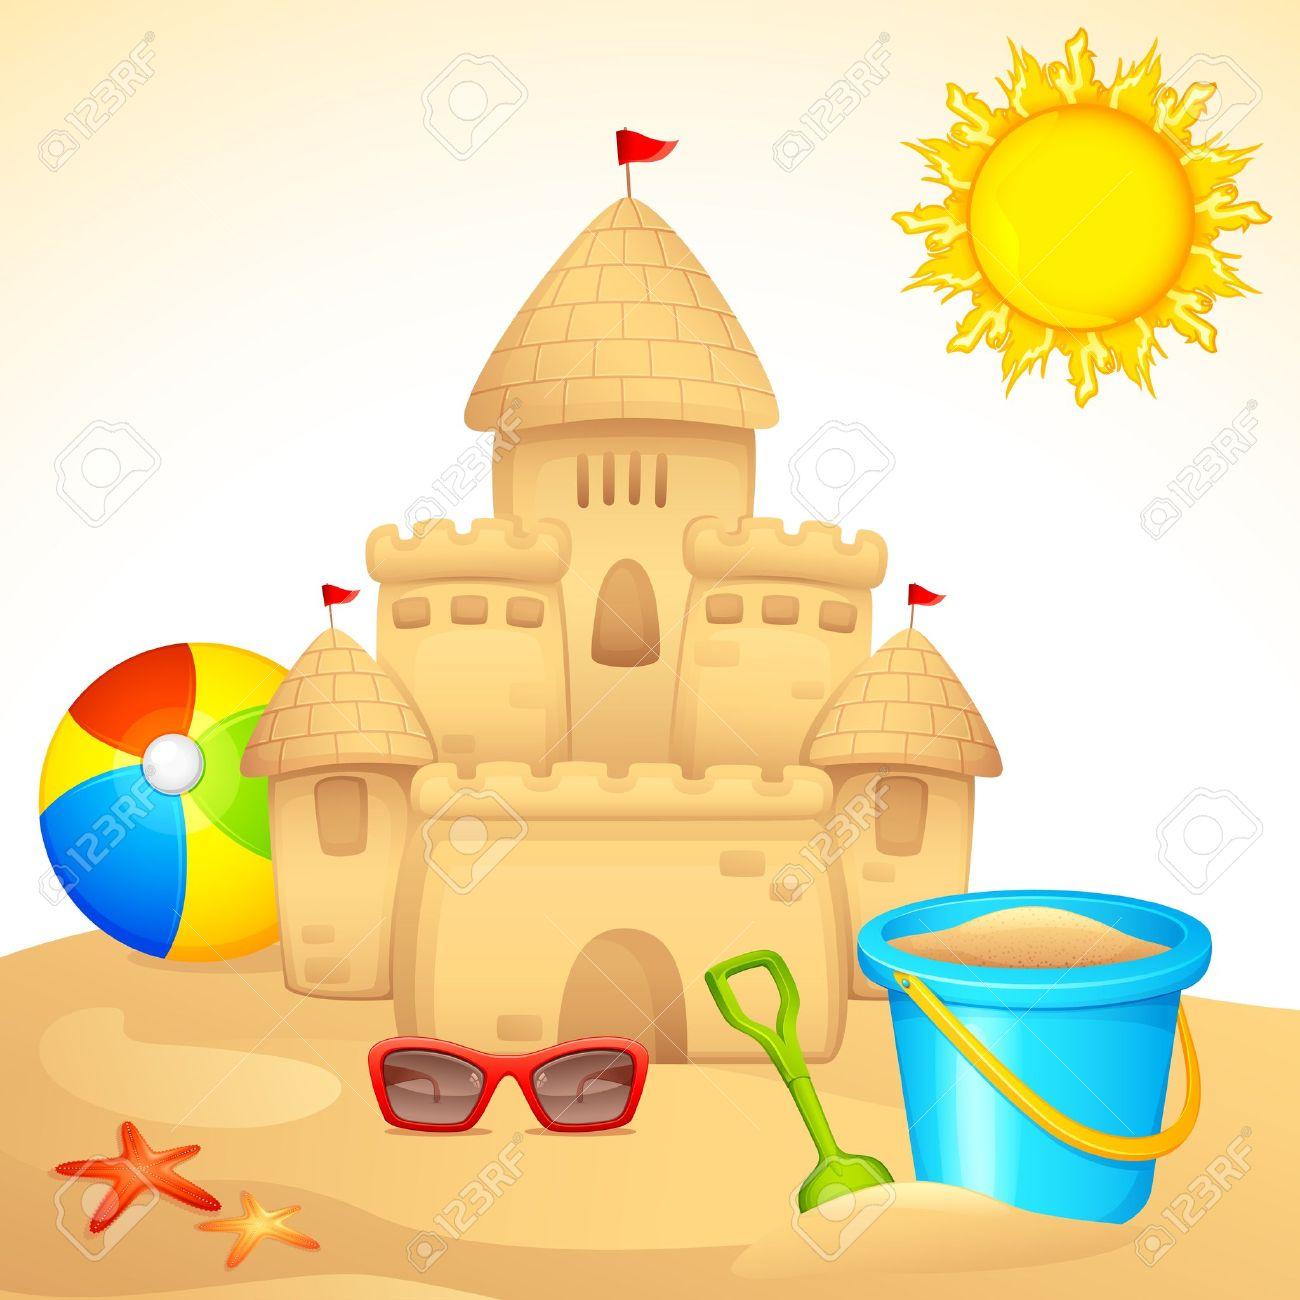 Cute Sand Castle Clip Art ... 0a35e718f7-Cute Sand Castle Clip Art ... 0a35e718f758f785f77669ce251e7c .-5